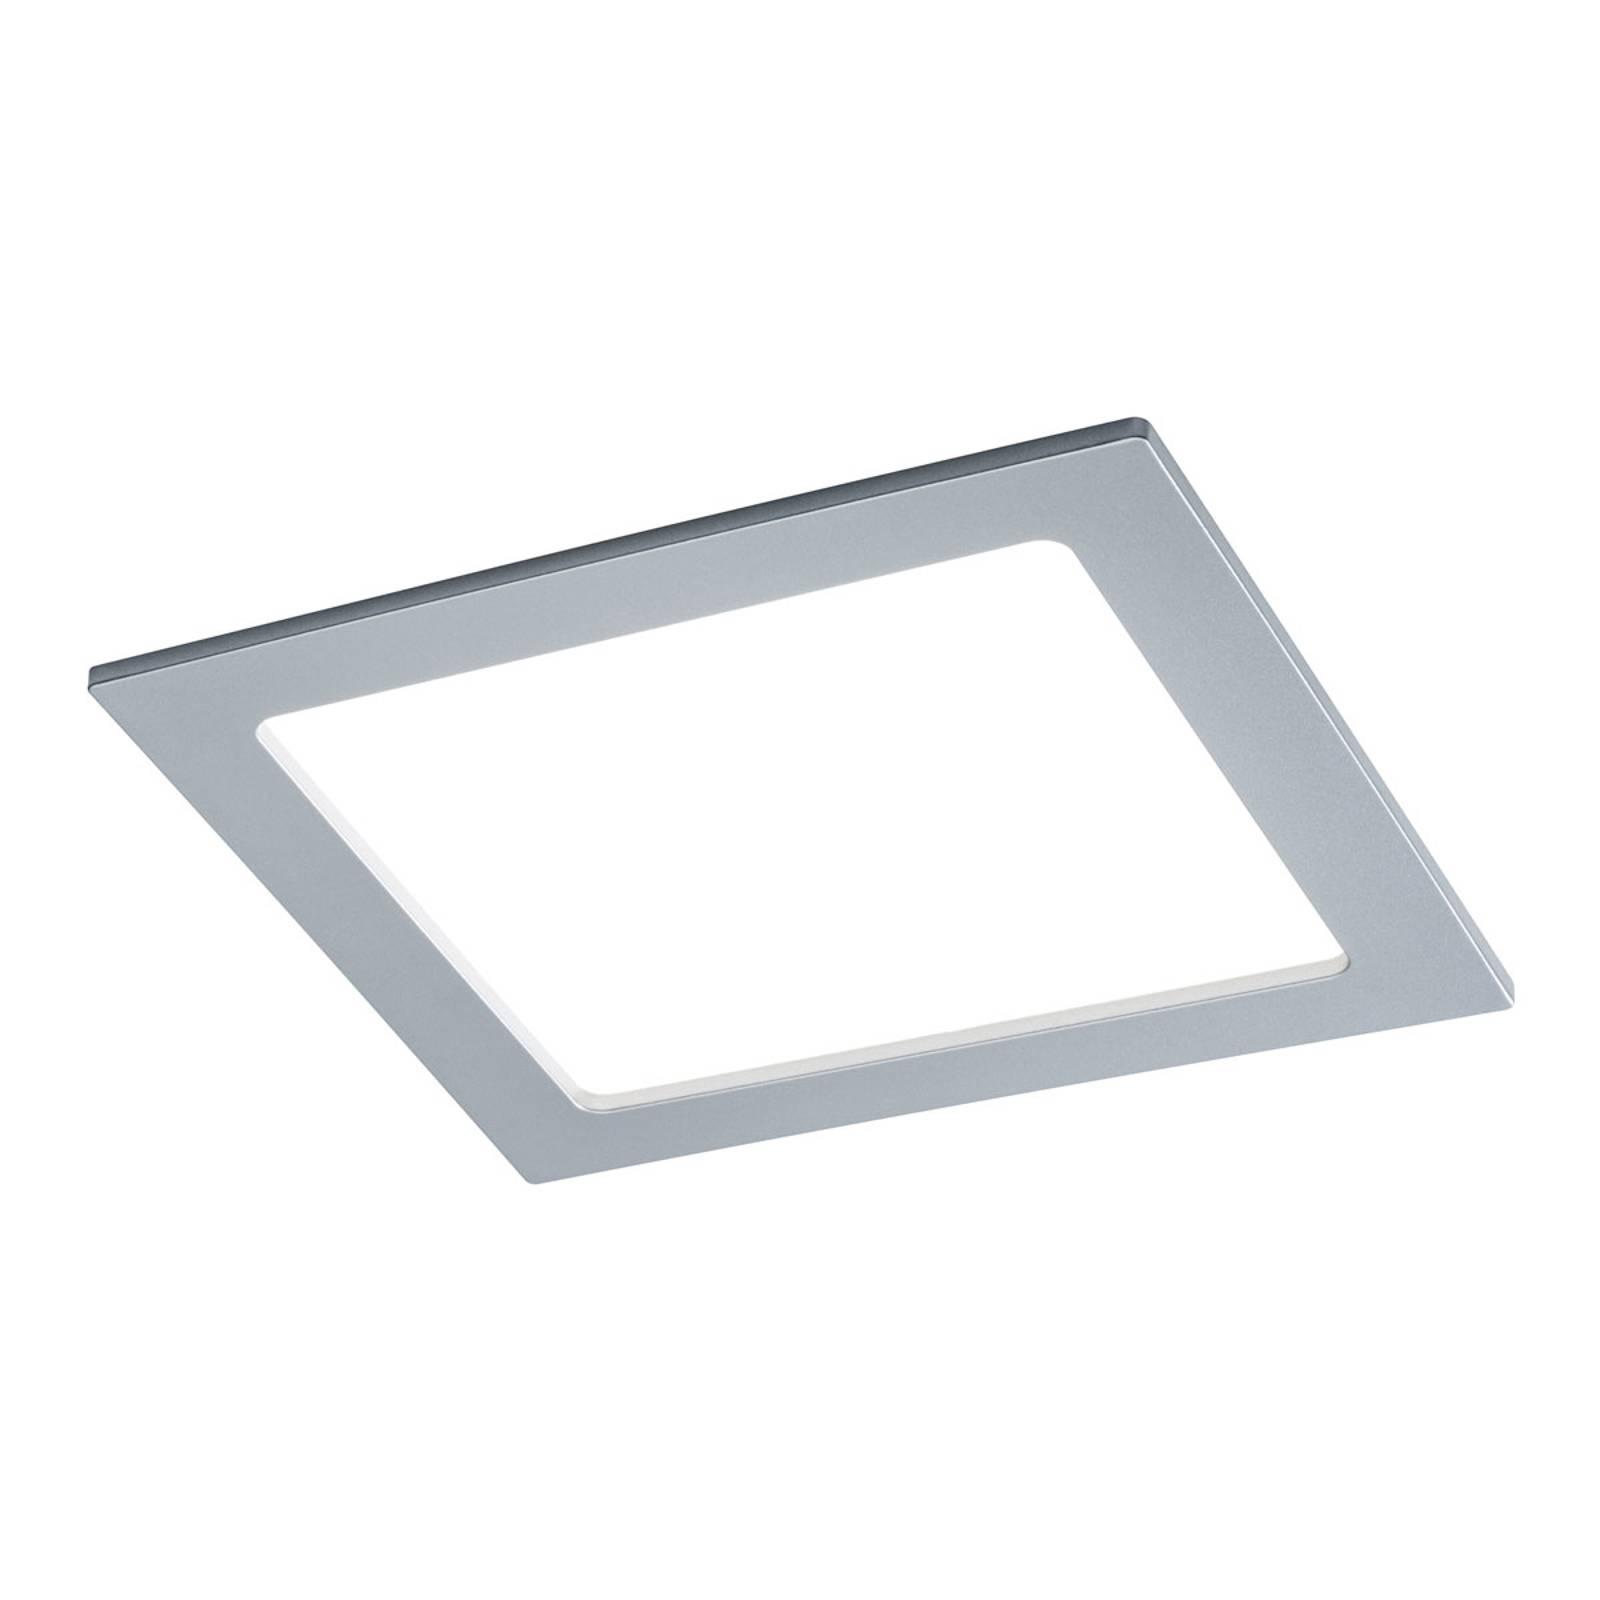 Paulmann LED-paneeli kulmikas 18 W, 4 000 K, kromi